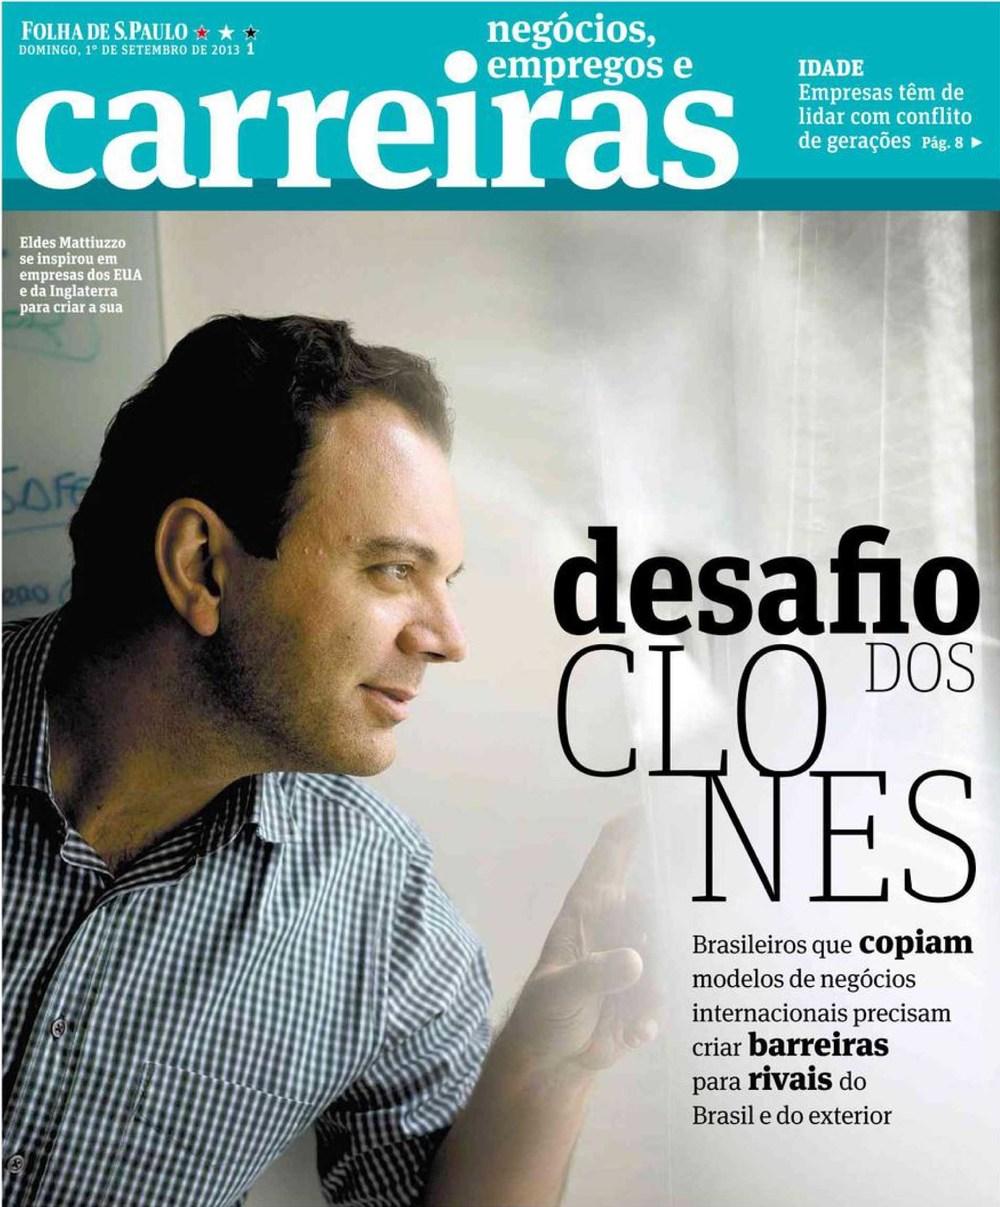 01.09.13-Folha de SP (capa caderno).jpeg